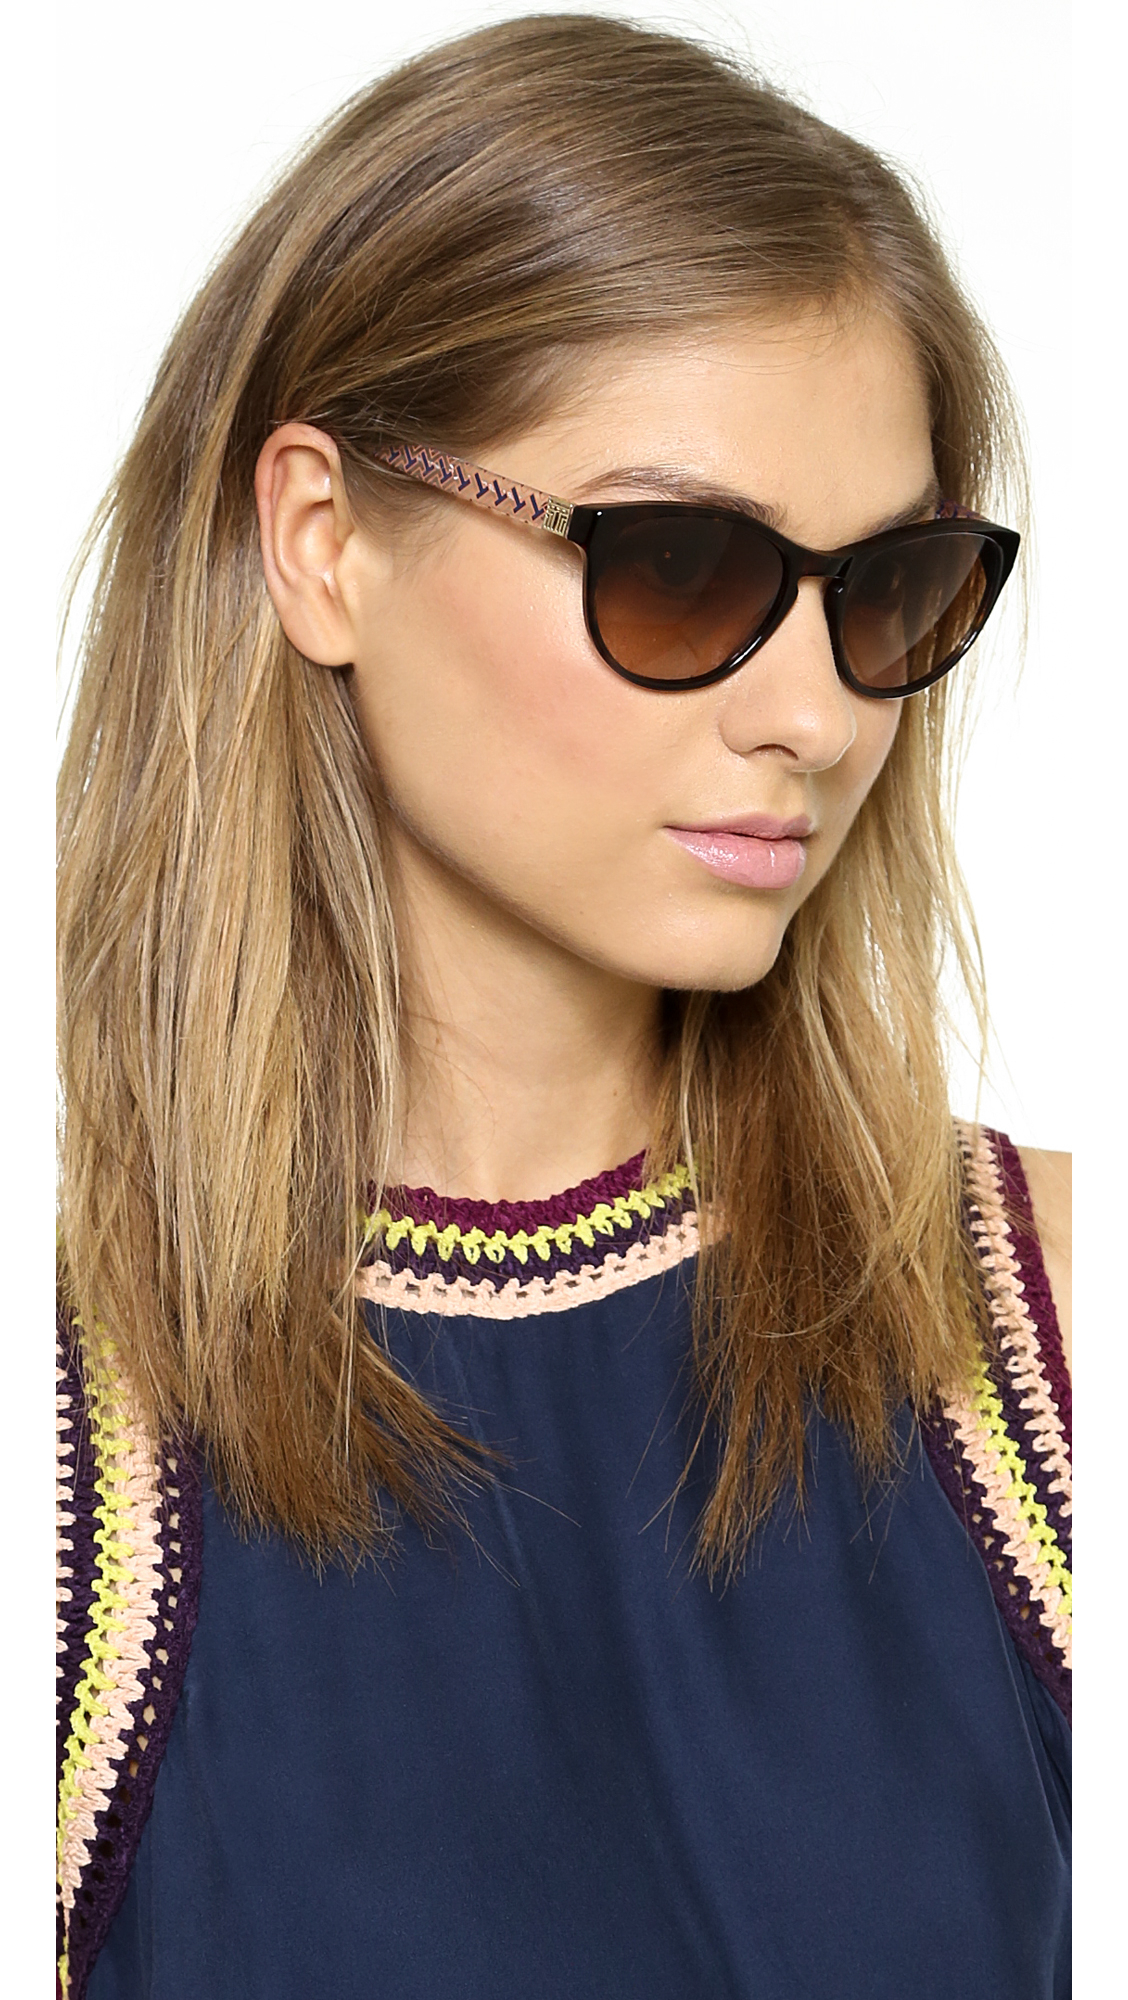 996cf8d00c20 Tory Burch Round Sunglasses - Dark Tortoise/Navy Orange - Lyst